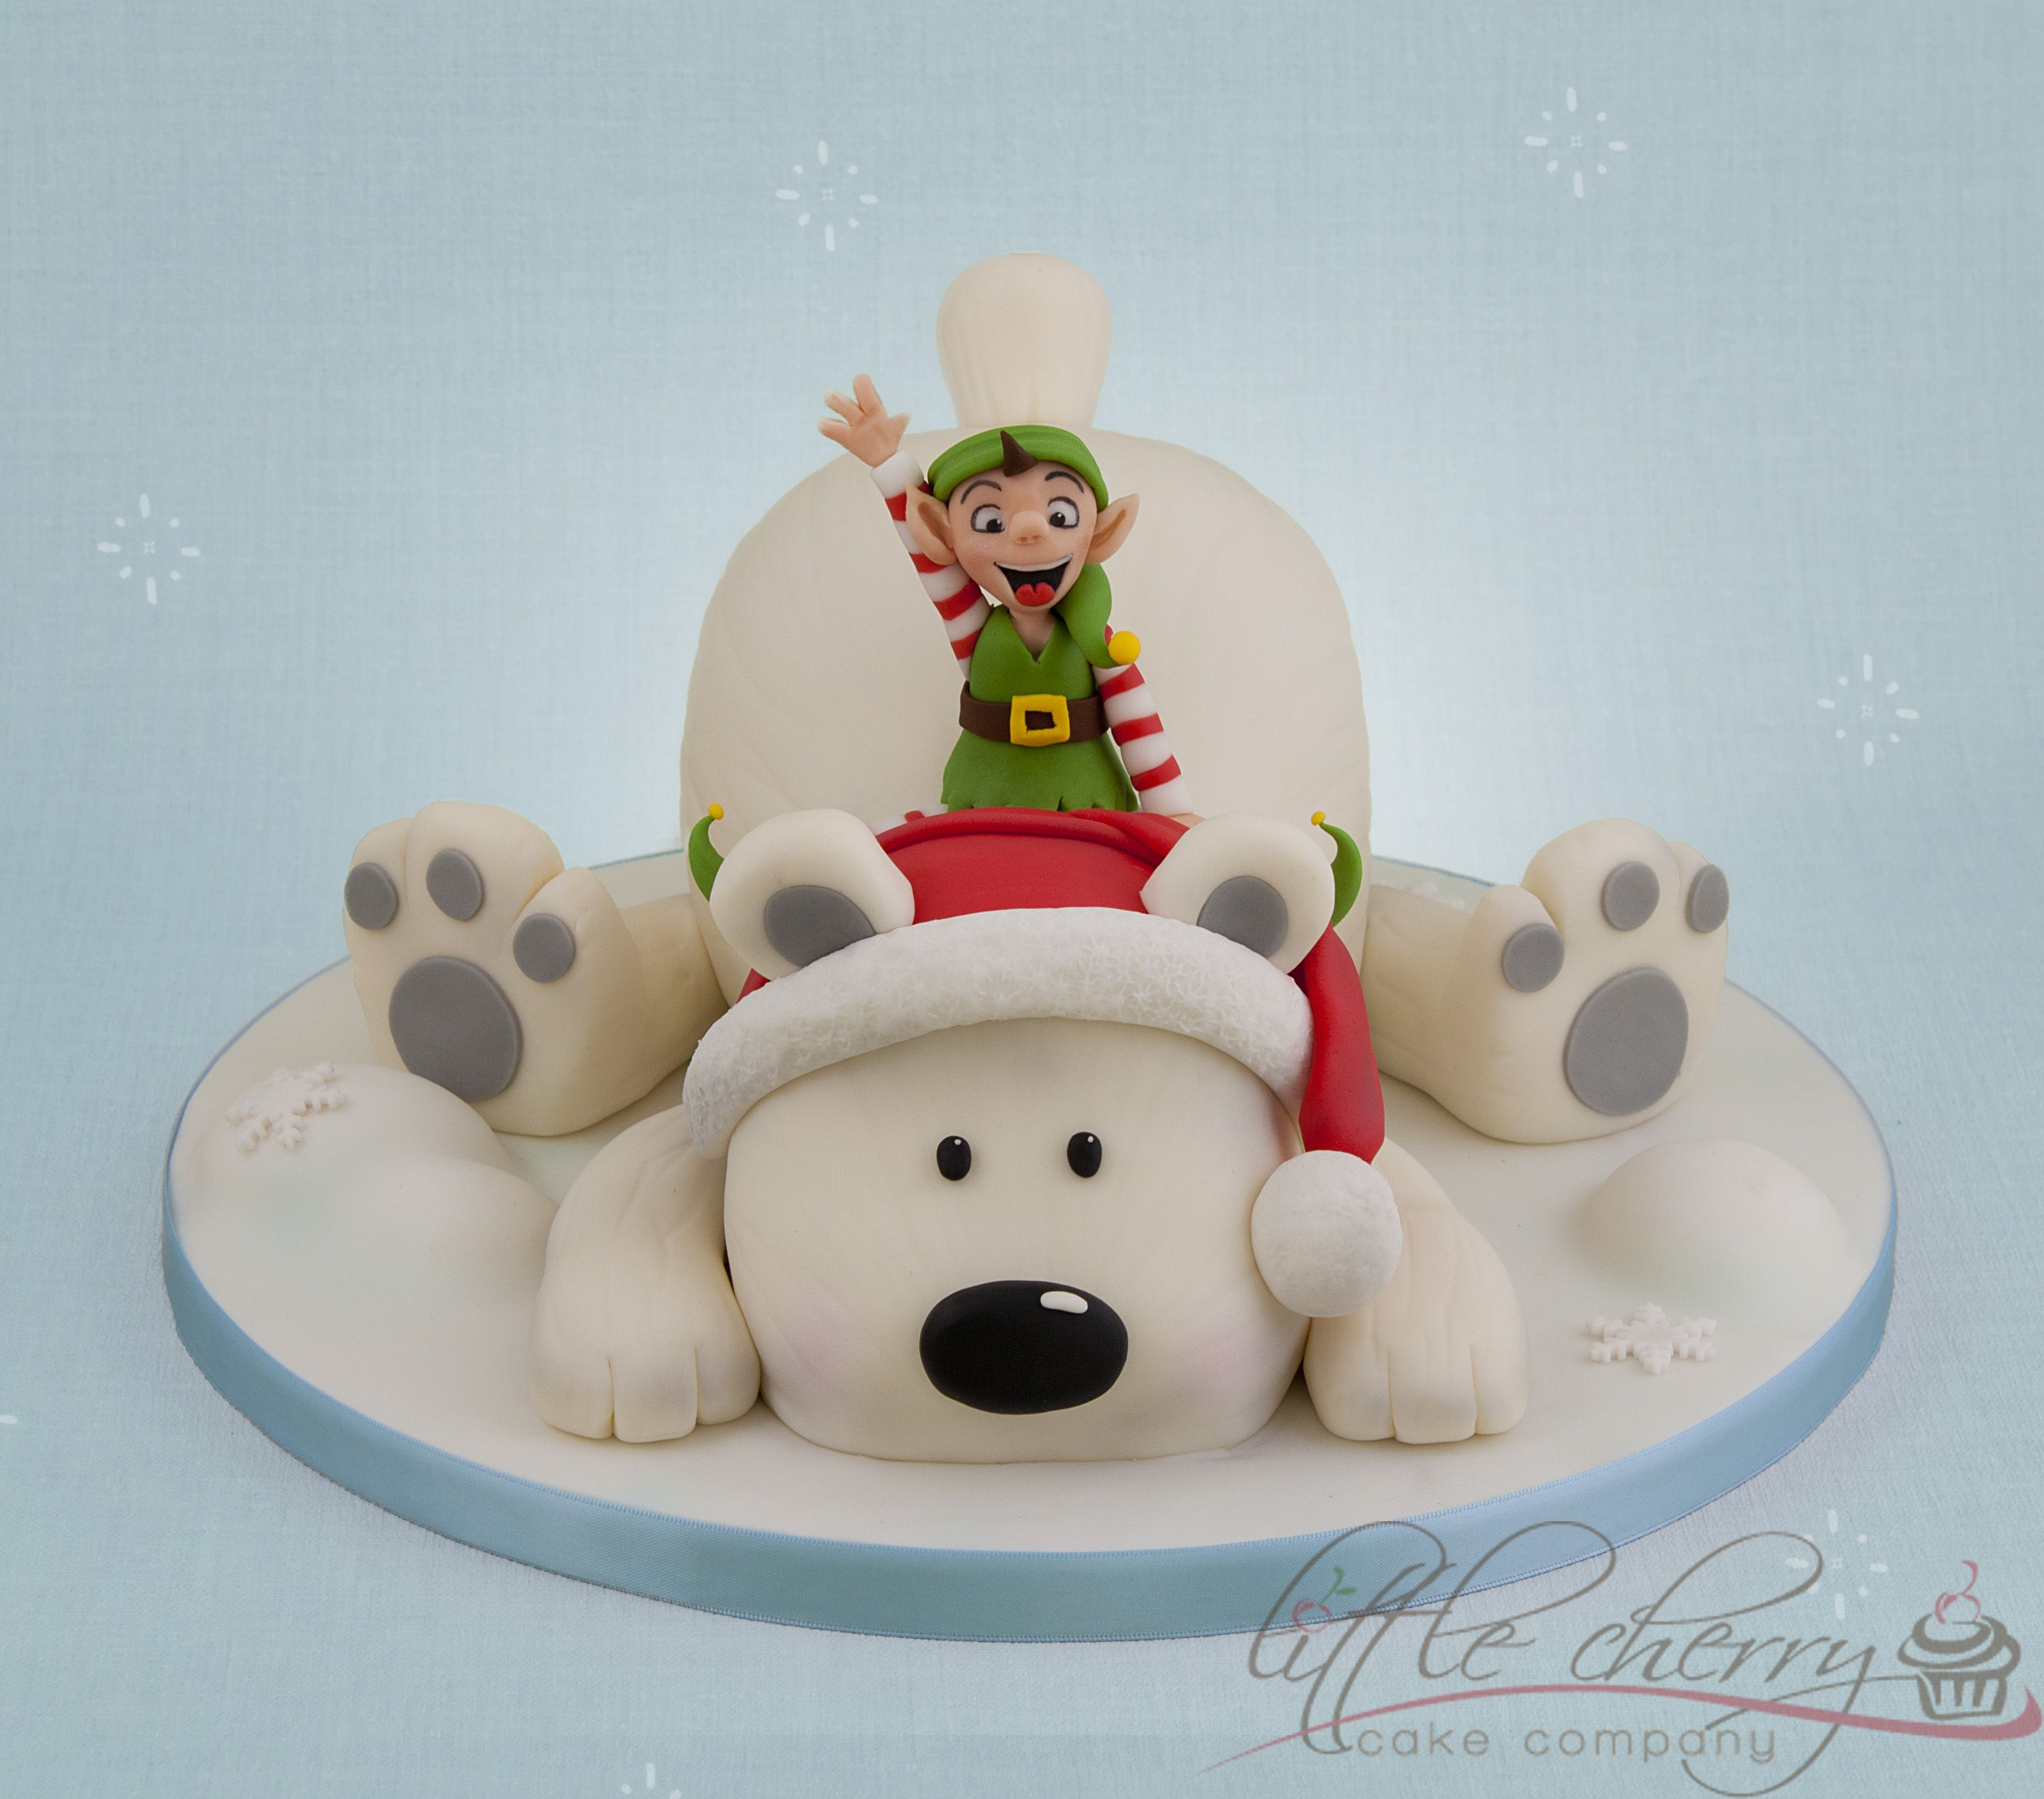 Polar Bear and Elf Christmas cake decorations, Christmas